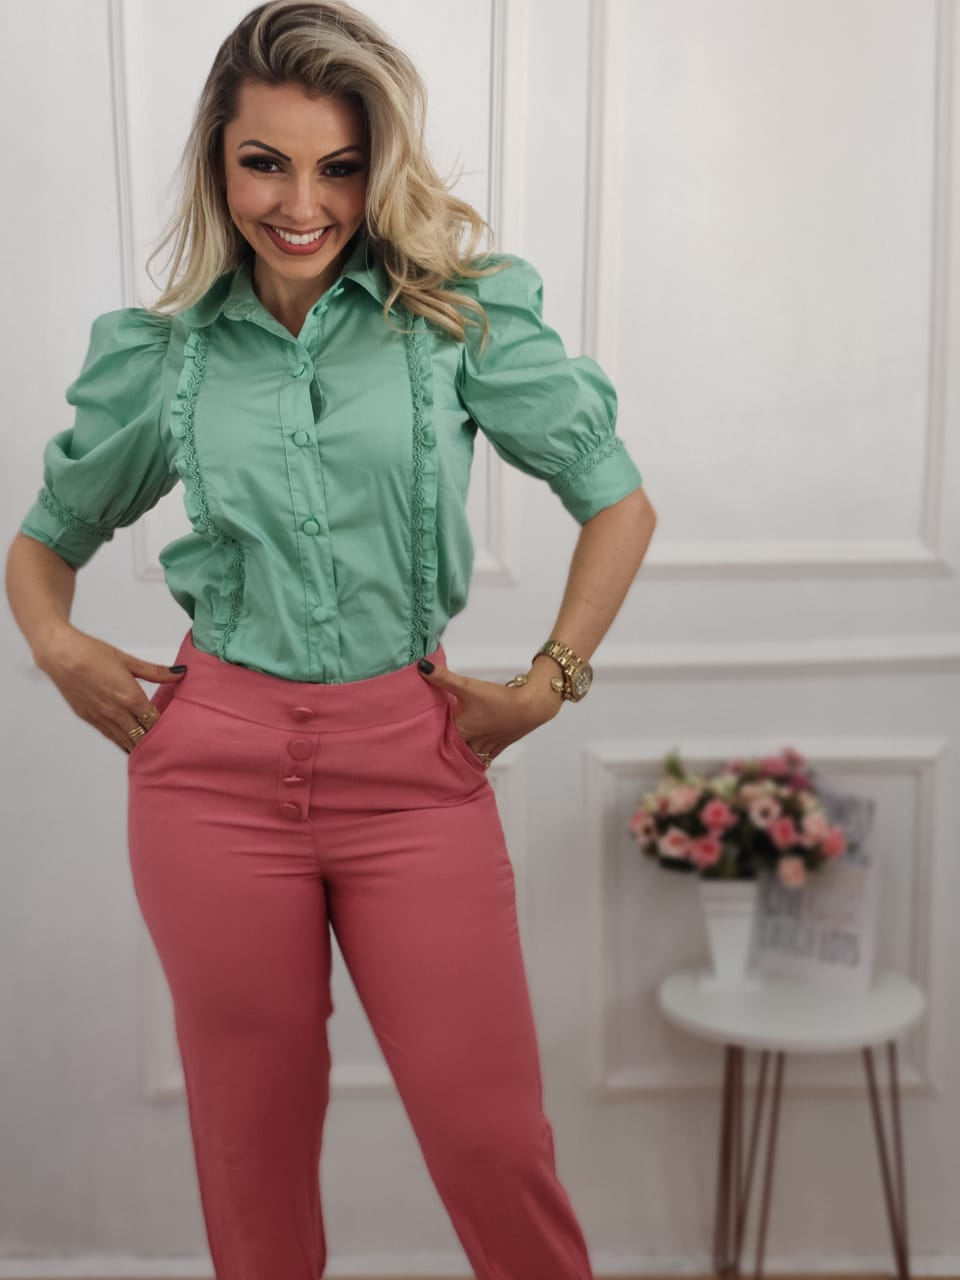 Look: 1 Camisa Manga Curta Bufante Verde + 1 Calça Skinny Laço Rosa